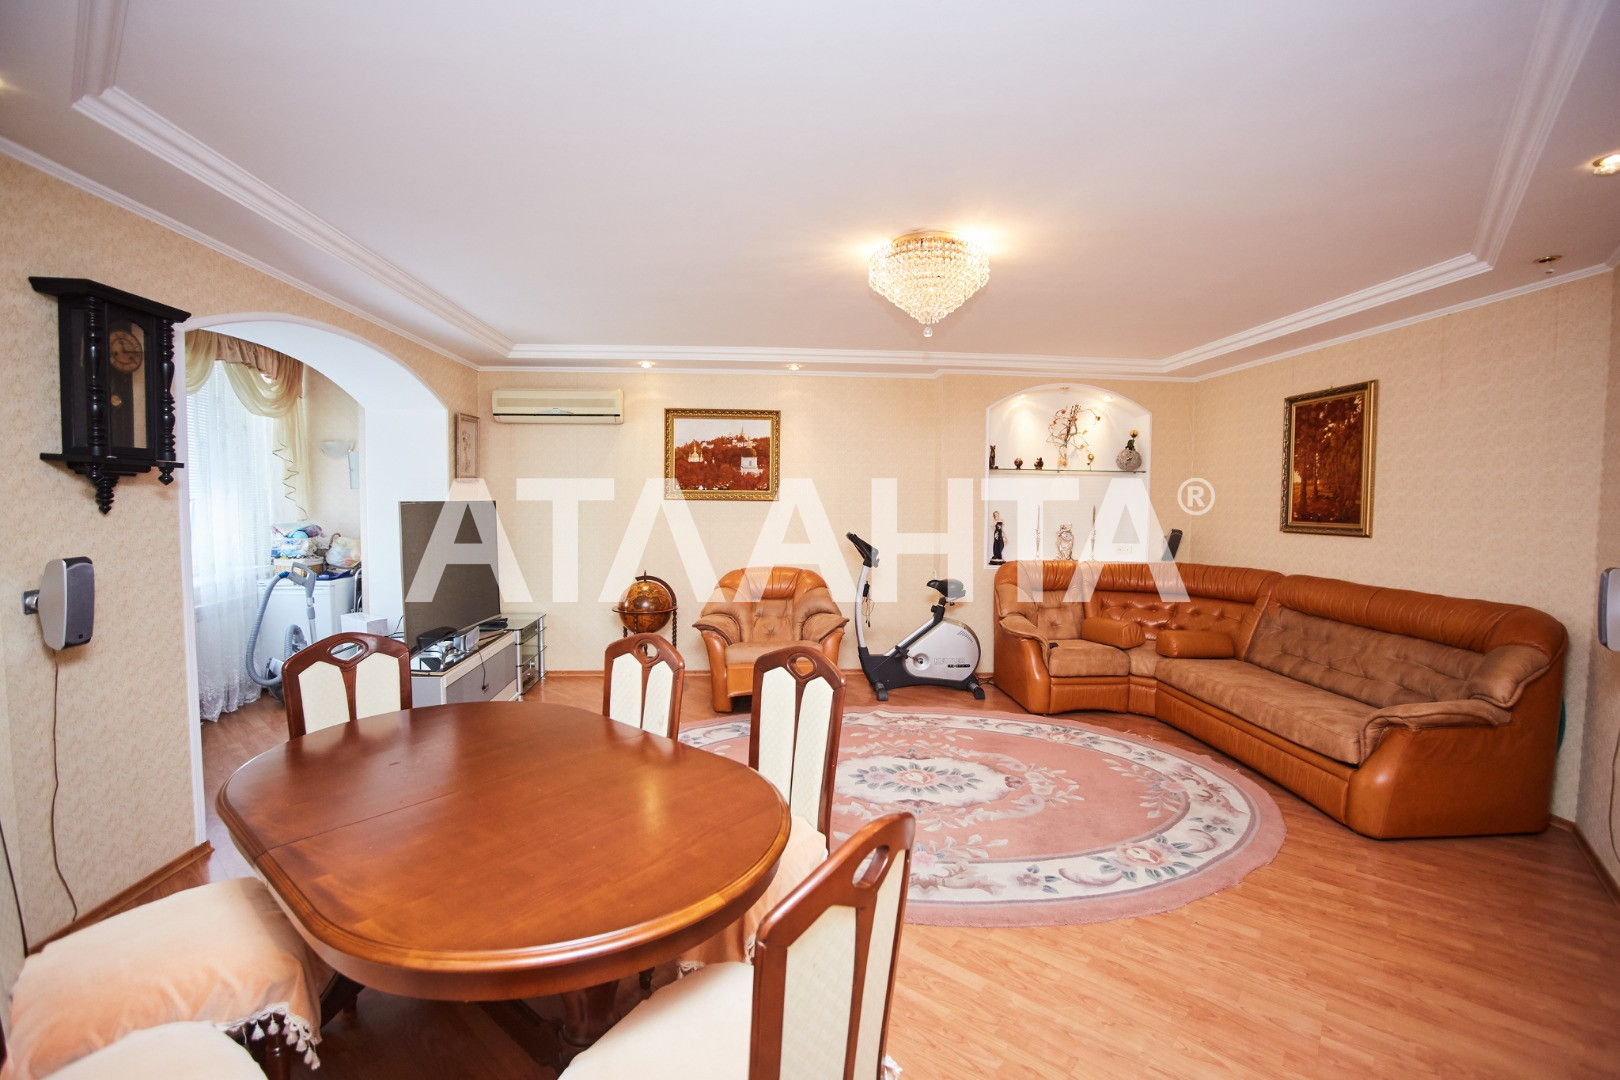 Продается Многоуровневая Квартира на ул. Посмитного — 295 000 у.е. (фото №11)